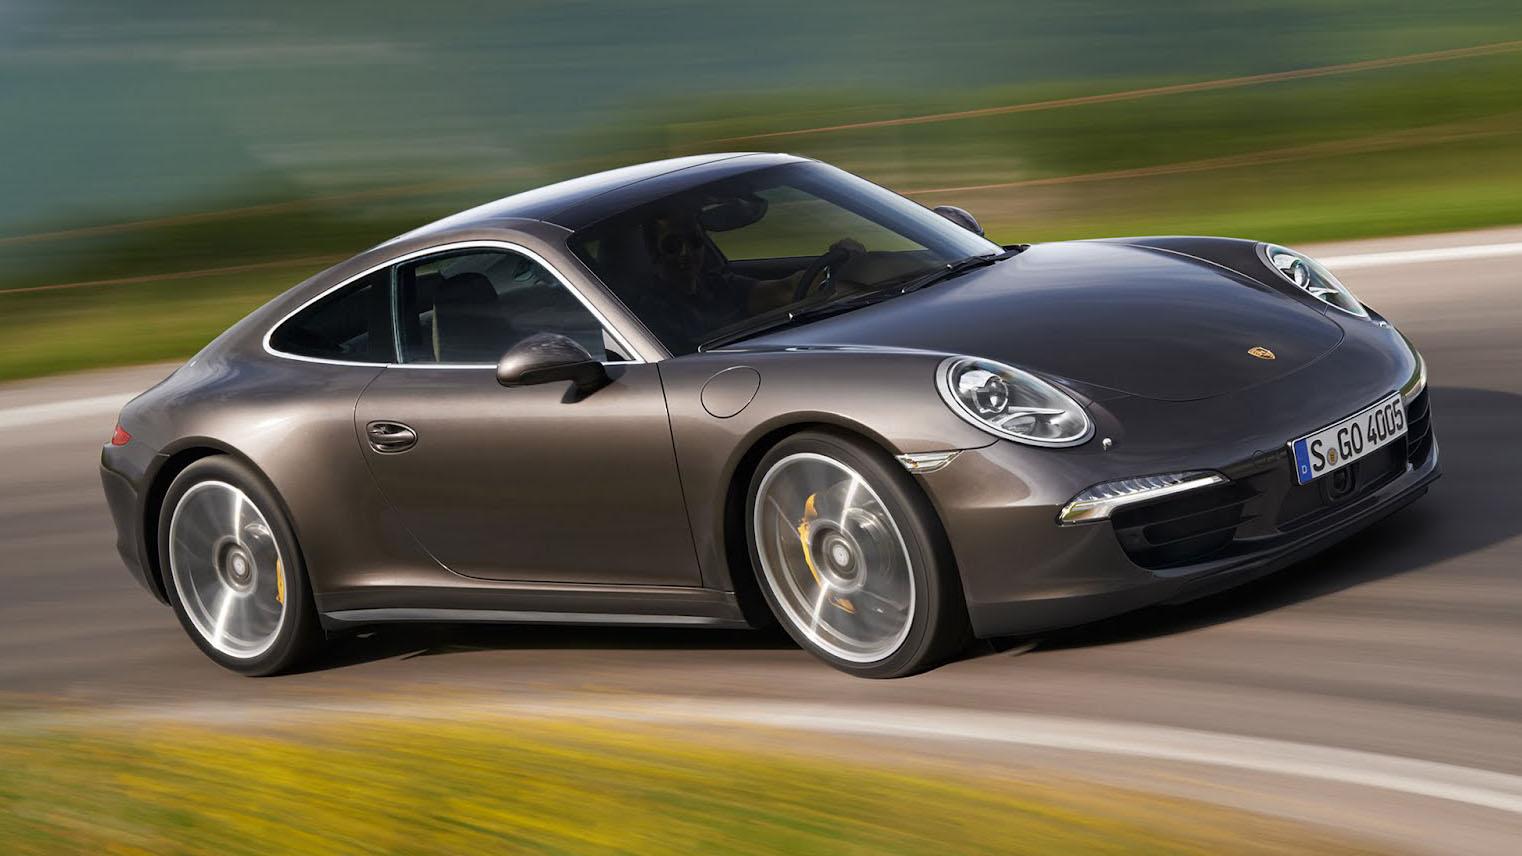 porsche wallpaper (Porsche 911)